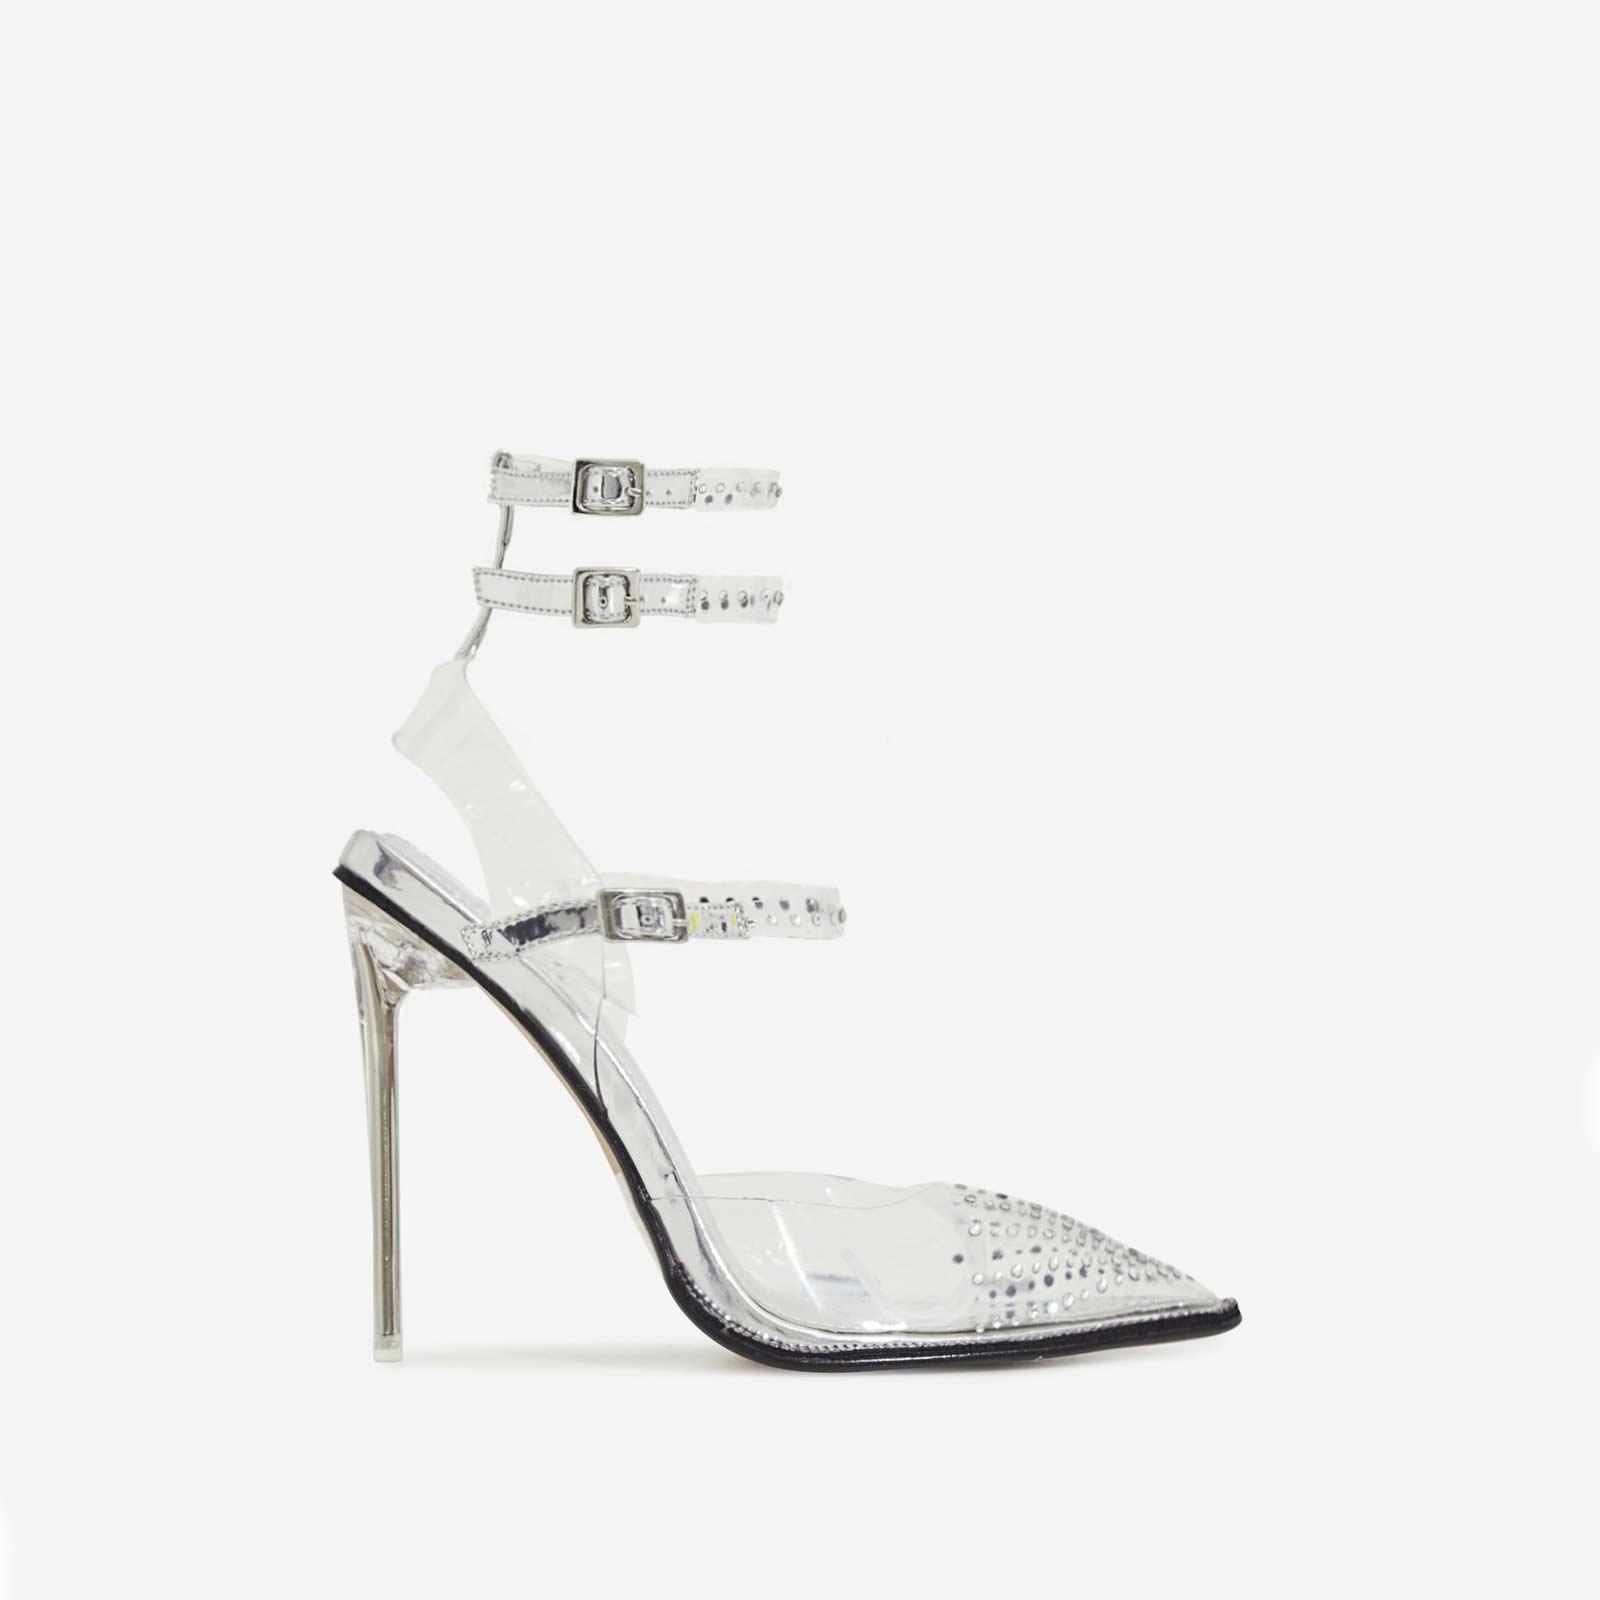 Margarita Diamante Details Perspex Heel In Silver Faux Leather